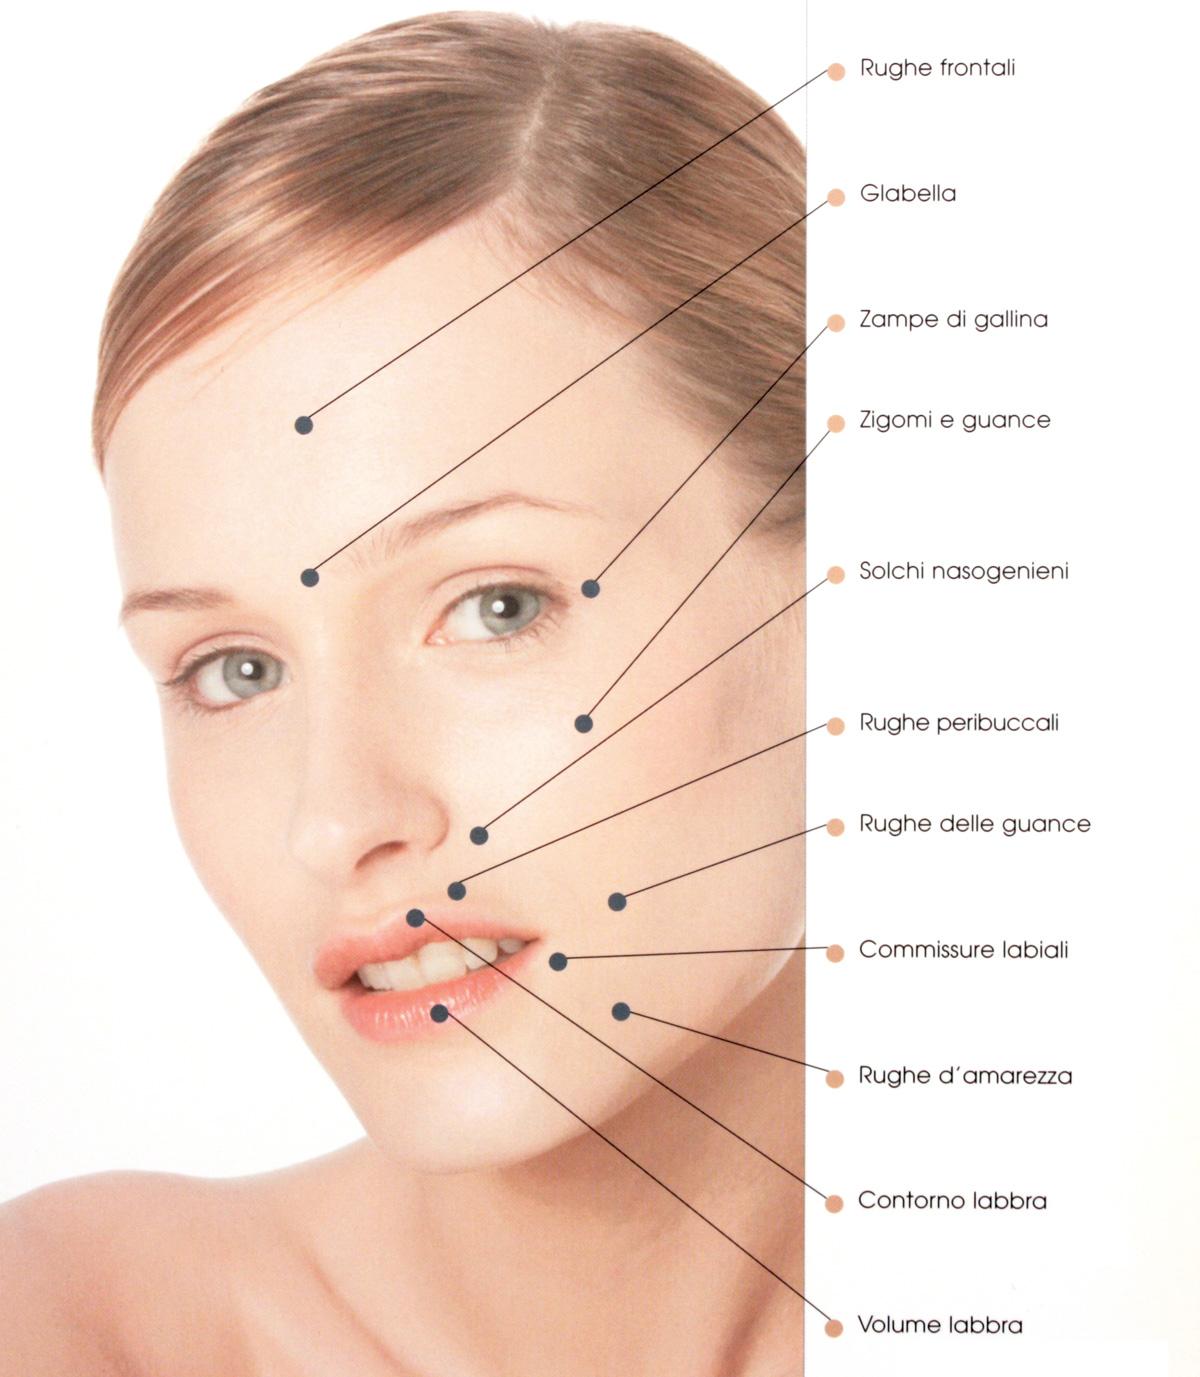 Maschera per pelle sensibile di occhi